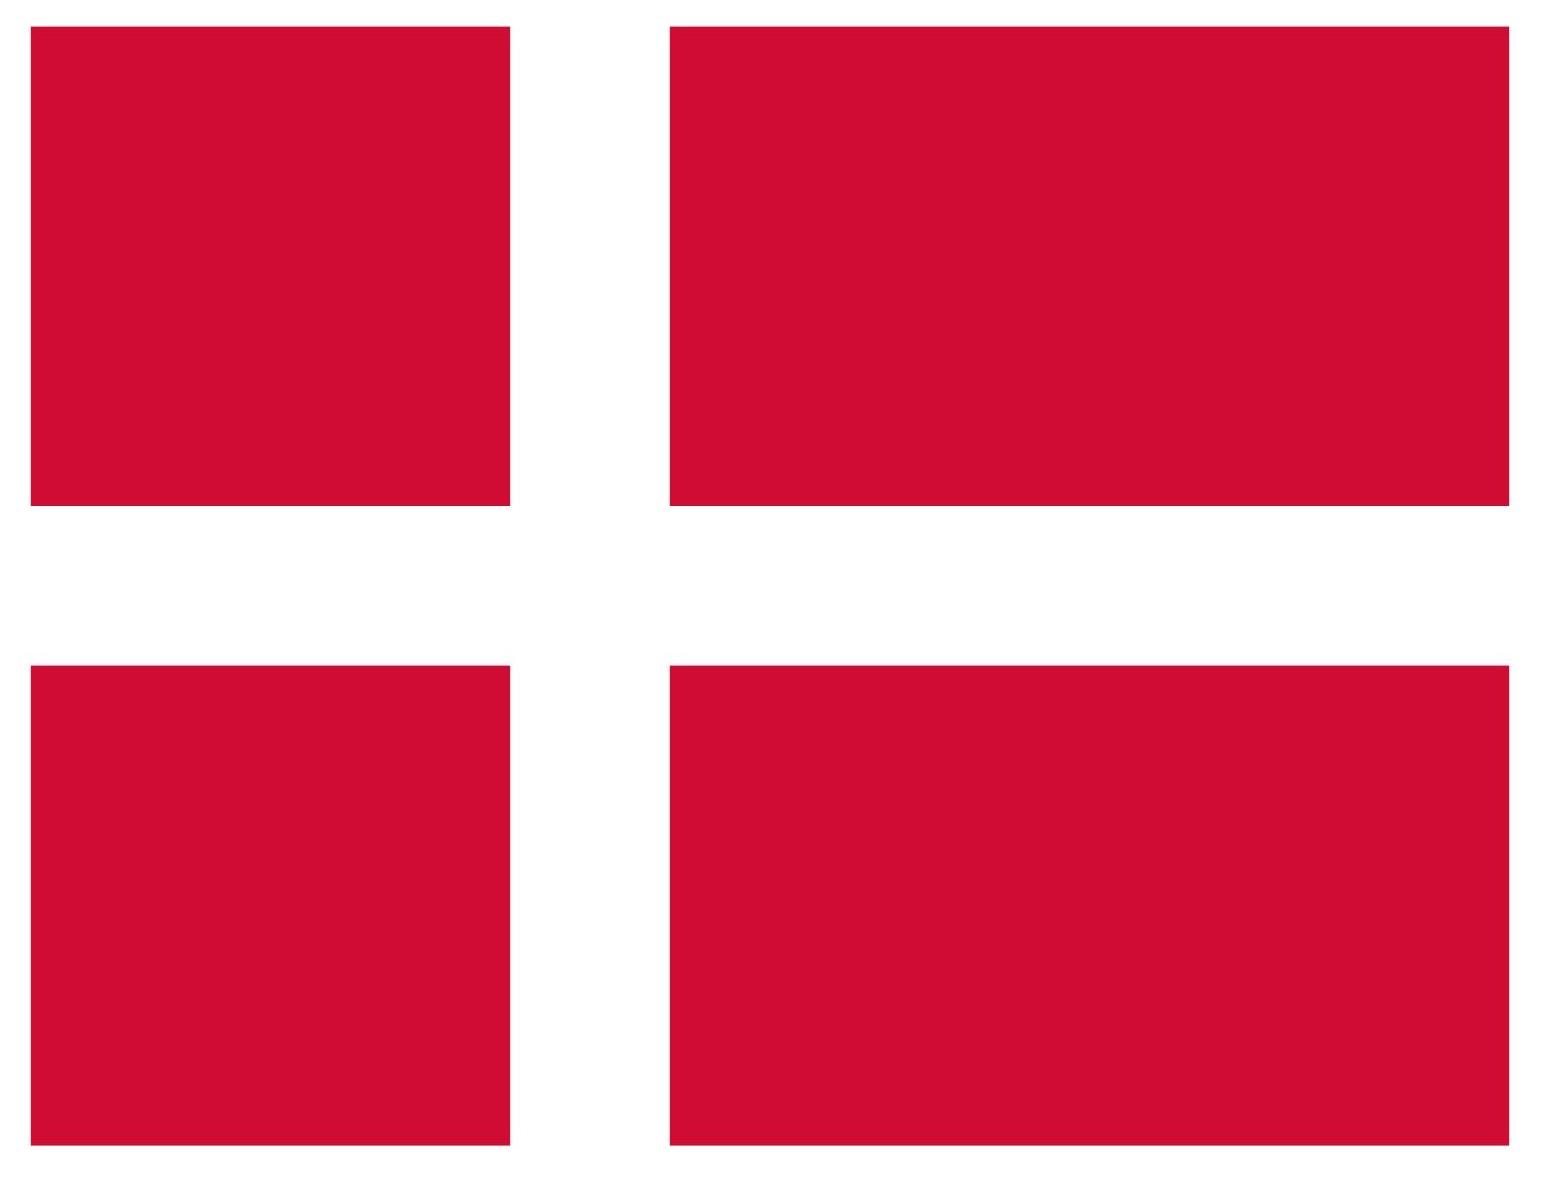 Denmark Flag [Danish] Vector EPS Free Download, Logo, Icons, Brand Emblems